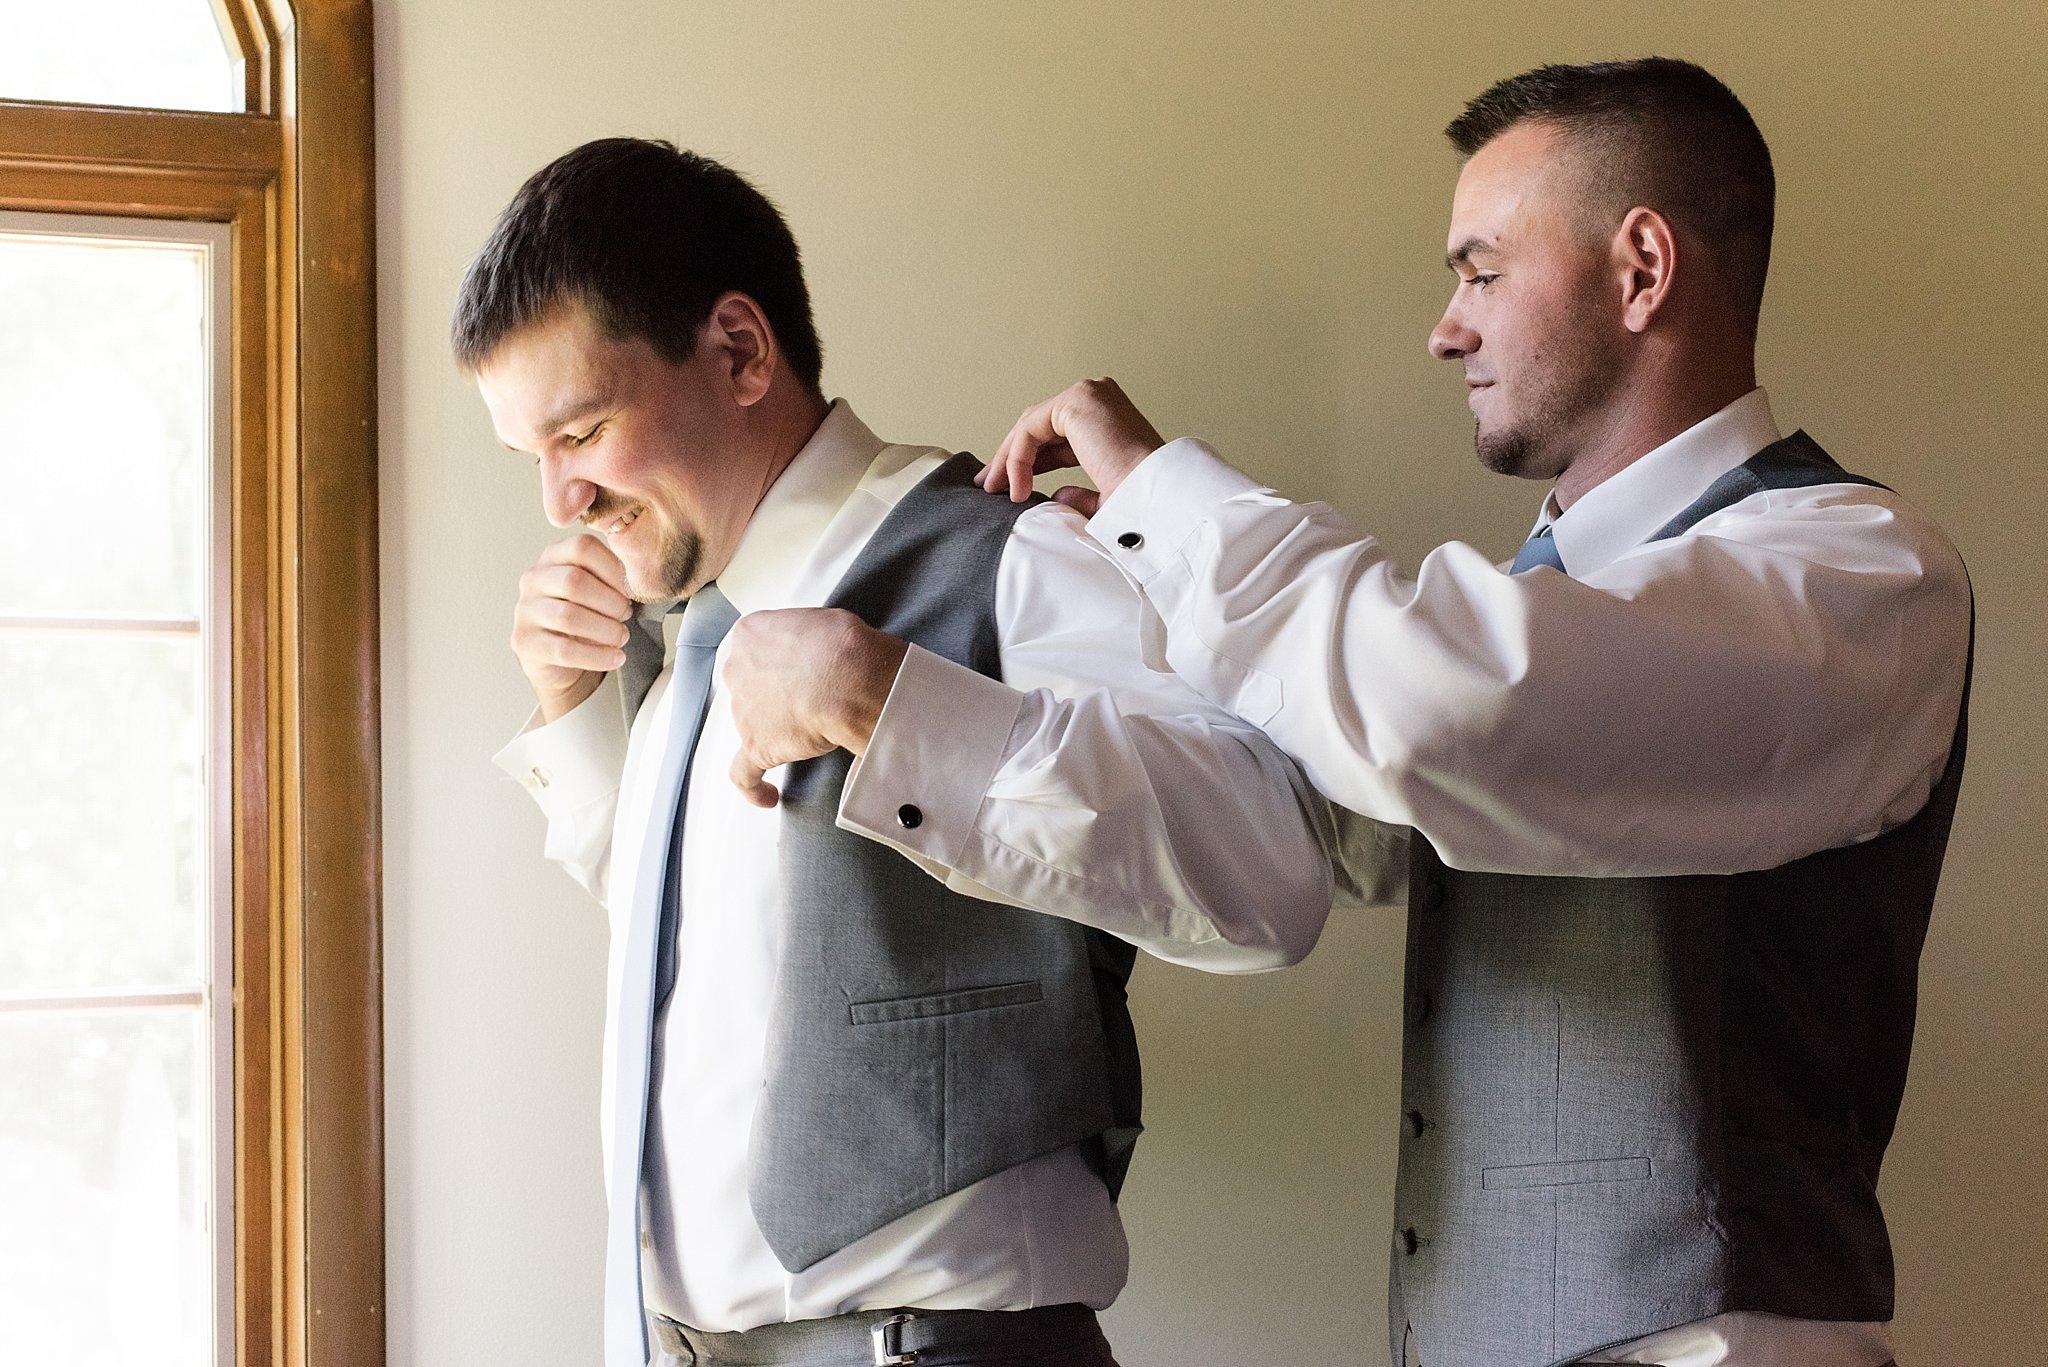 Cadillac-Michigan-wedding-caberfae-peaks-milwaukee-photographer_0009.jpg